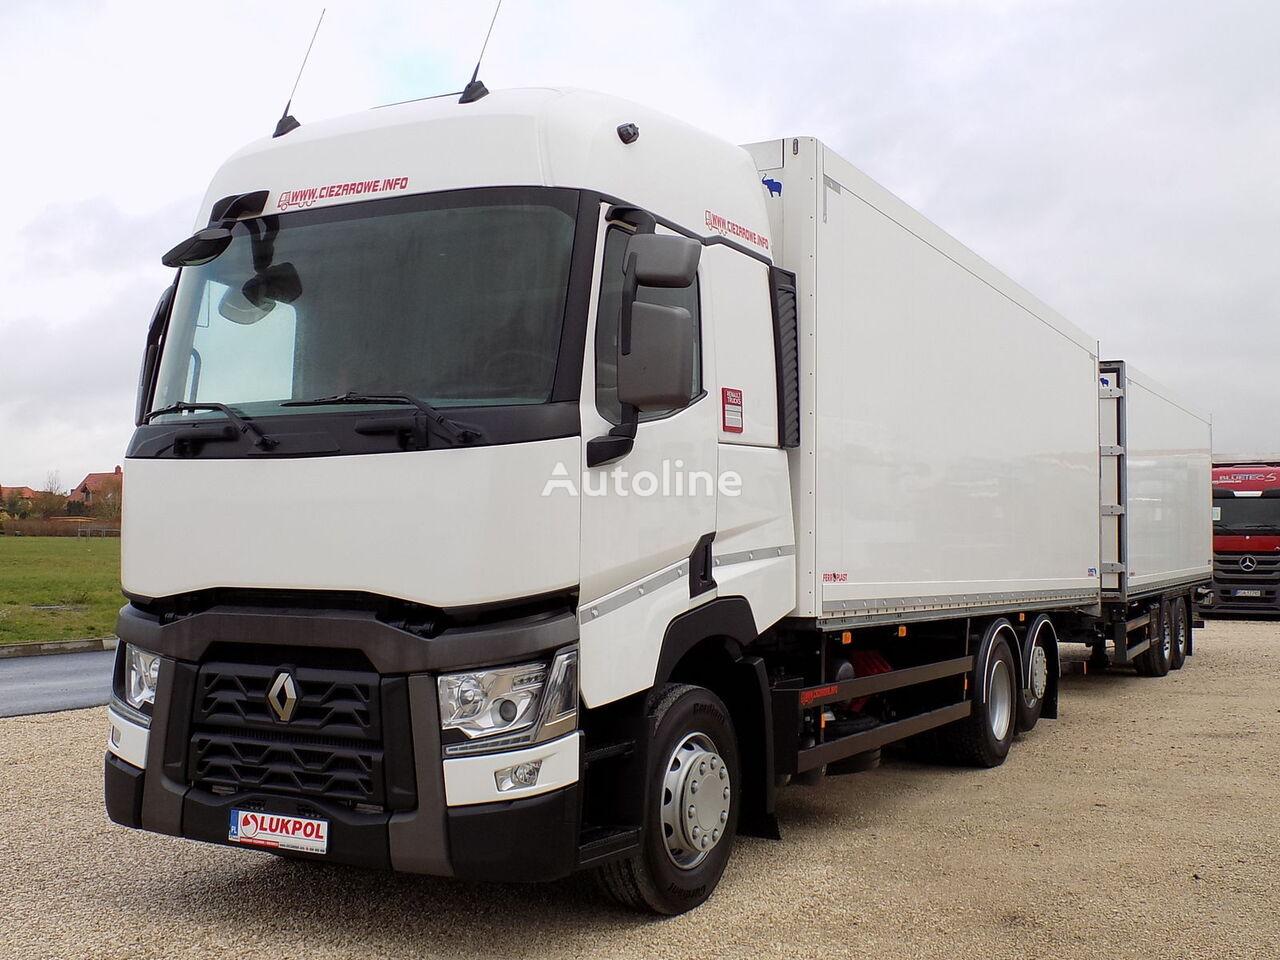 изотермический грузовик RENAULT T430 EURO 6 - ZESTAW TANDEM PRZEJAZDOWY - ALL NEW !! + изотермический прицеп